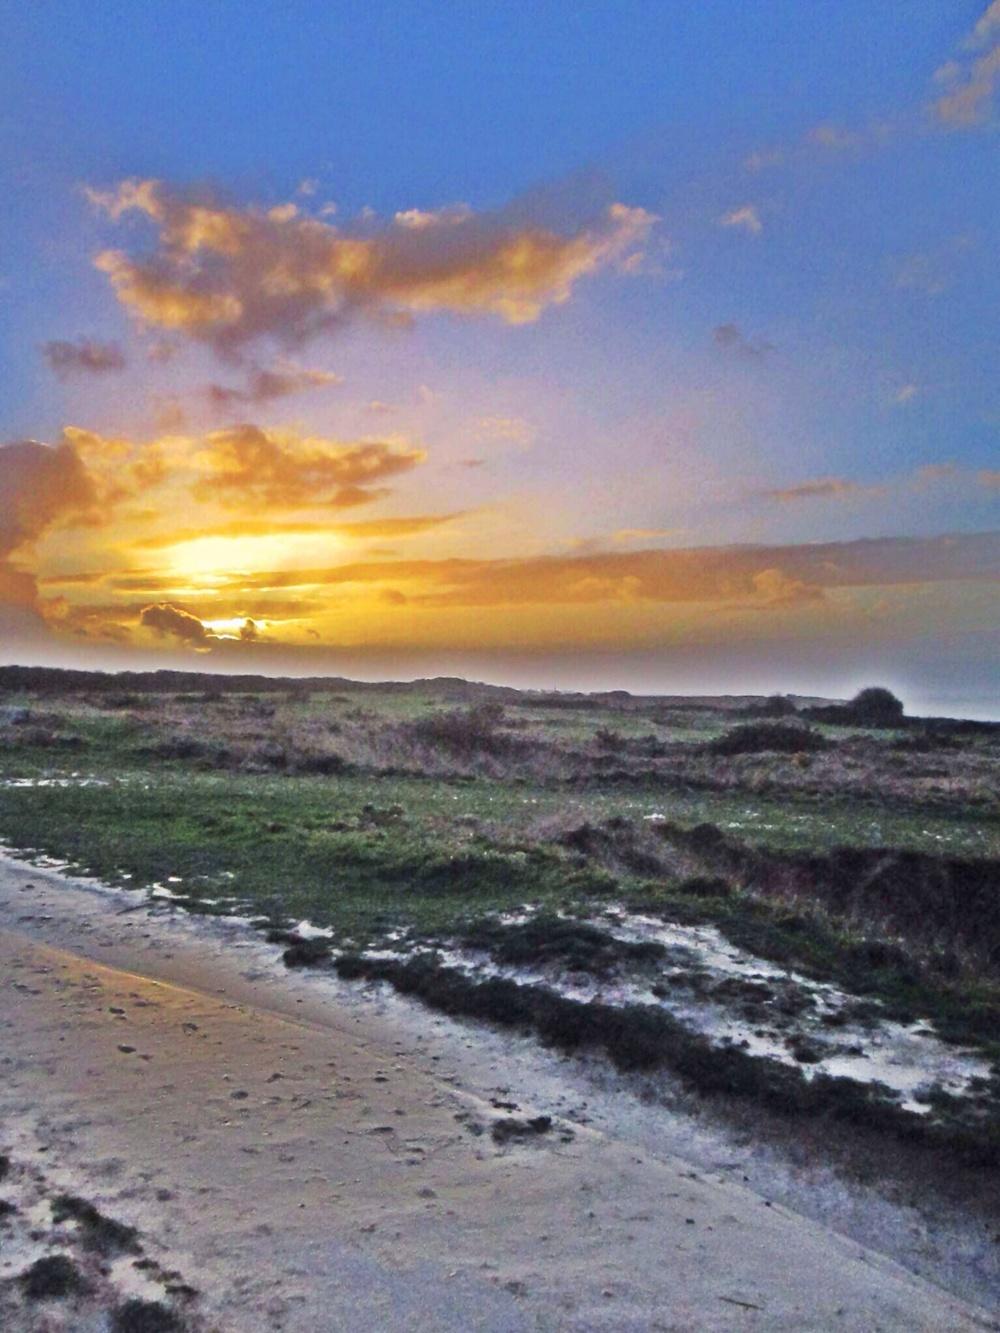 The sun sets on our Normandy tour at Pointe-du-Hoc